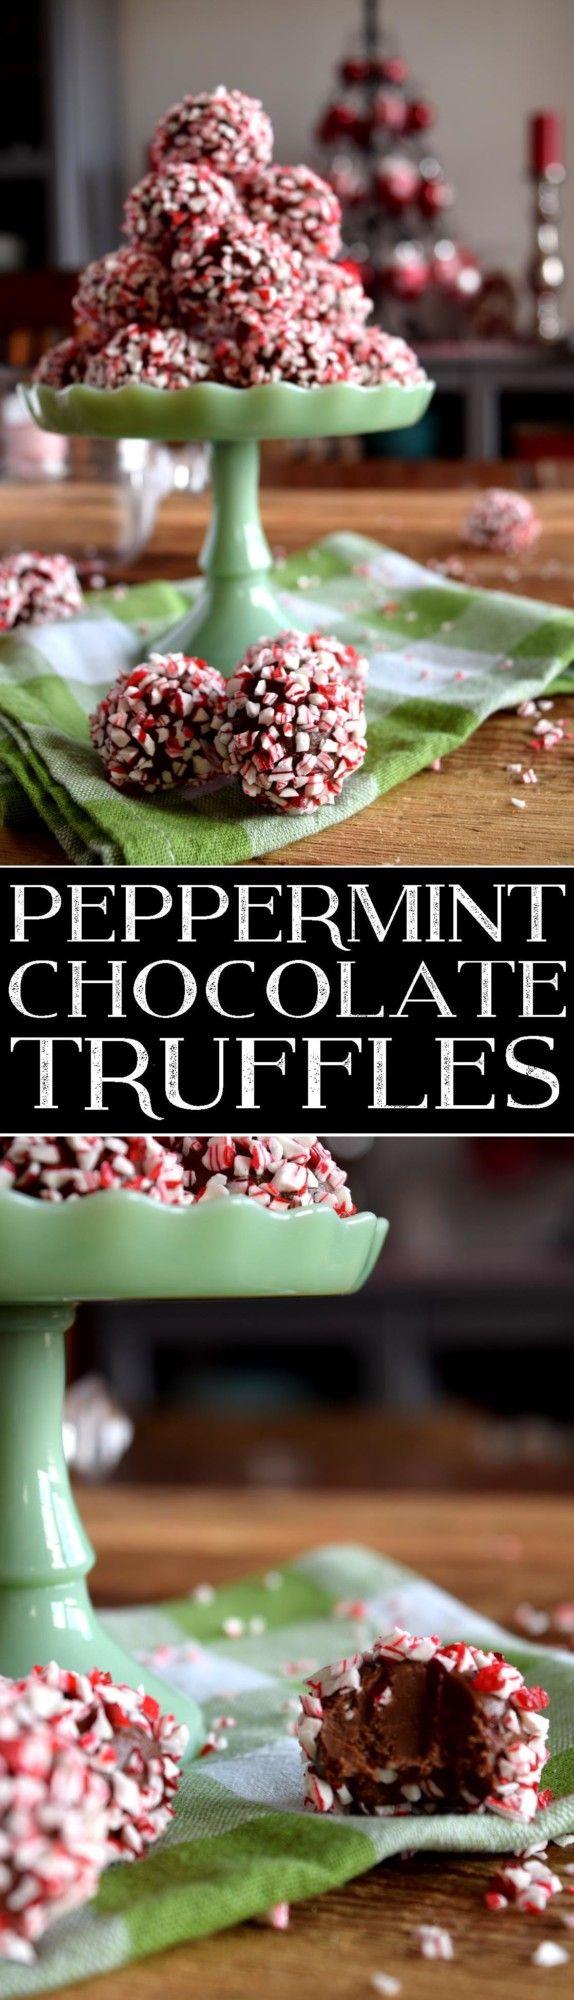 peppermint-chocolate-truffles